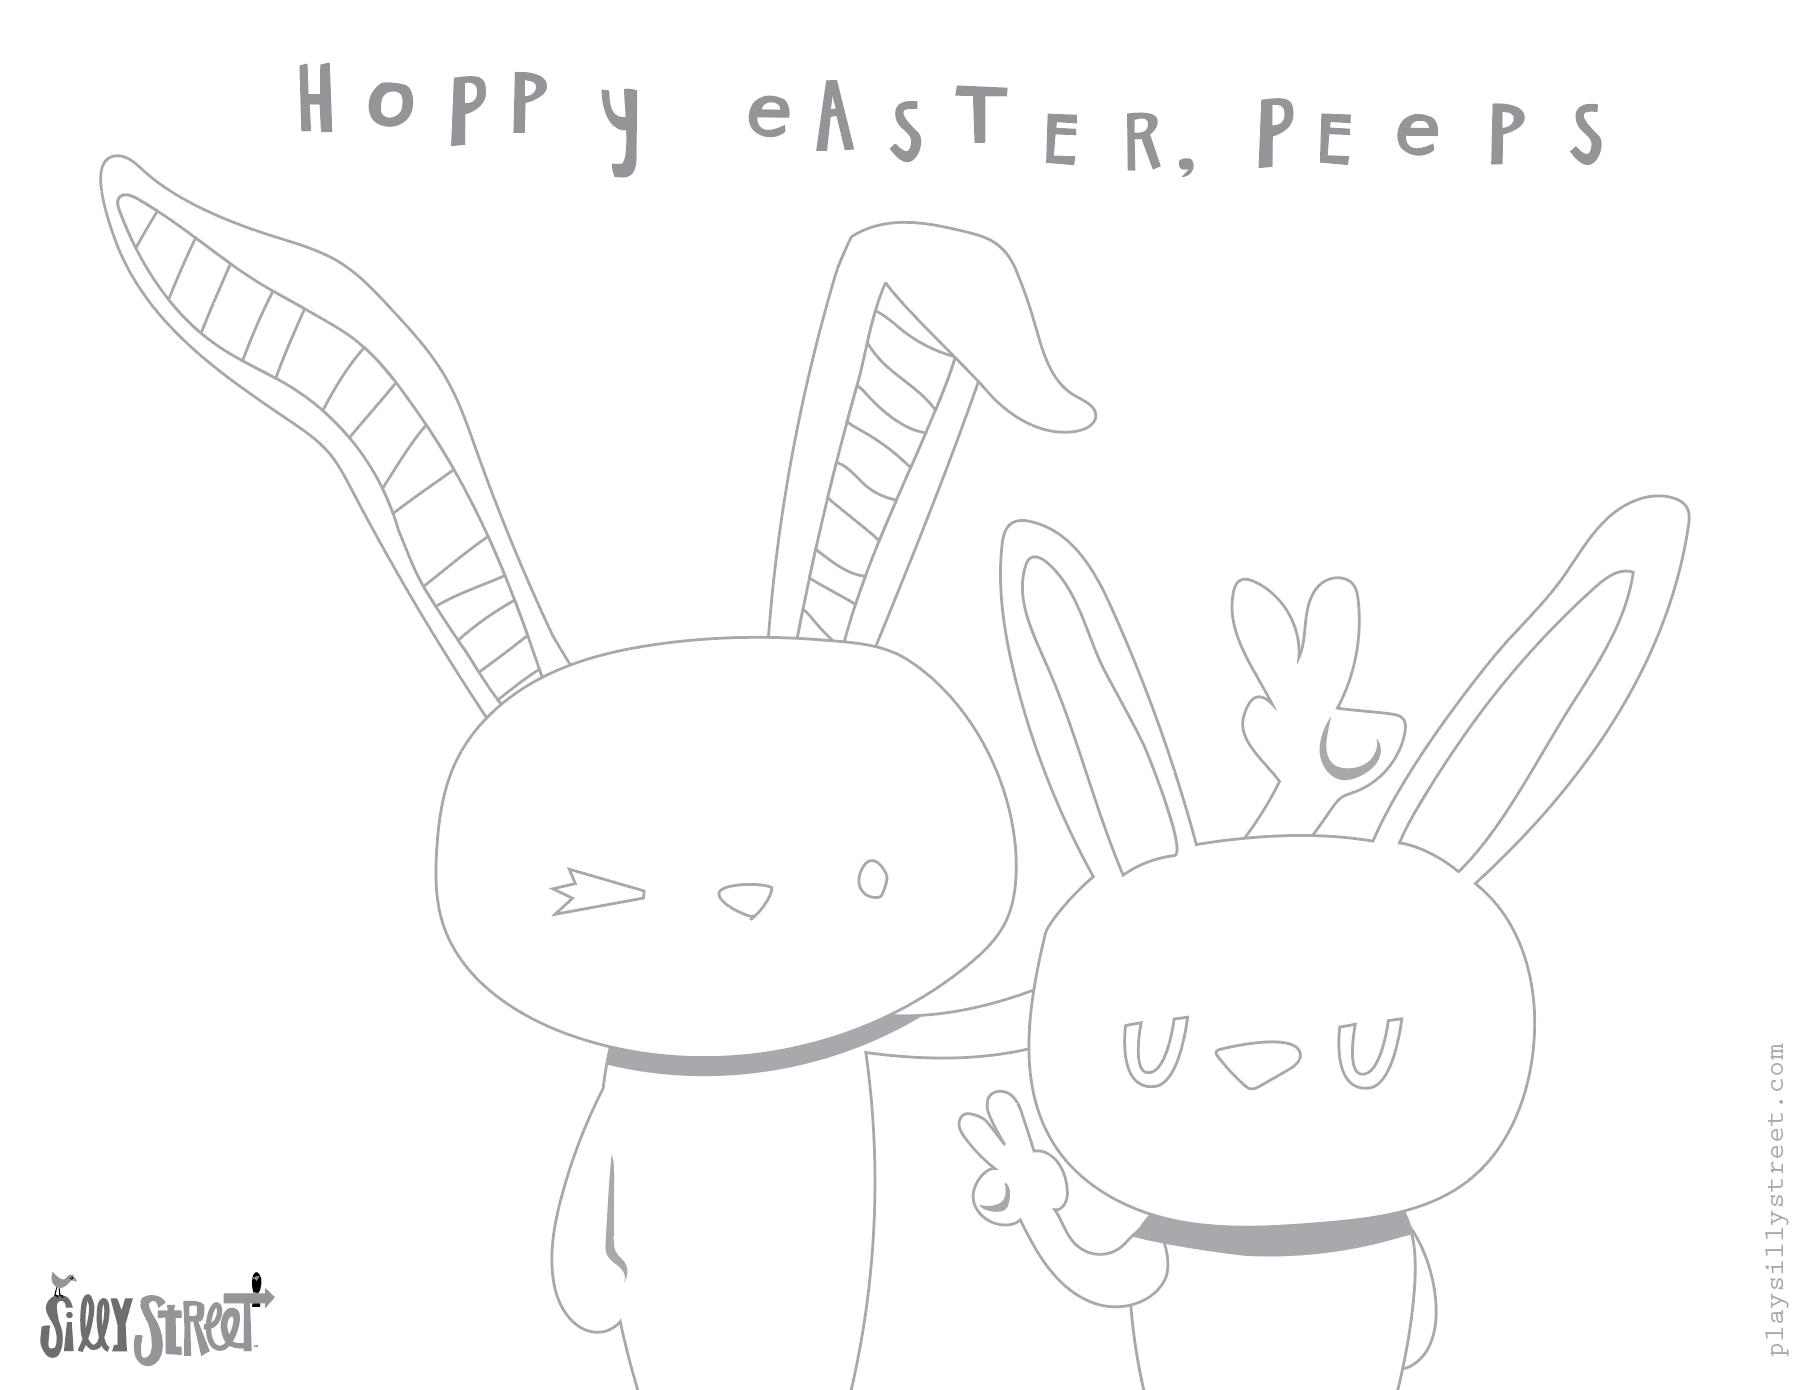 Happy Easter Peeps!